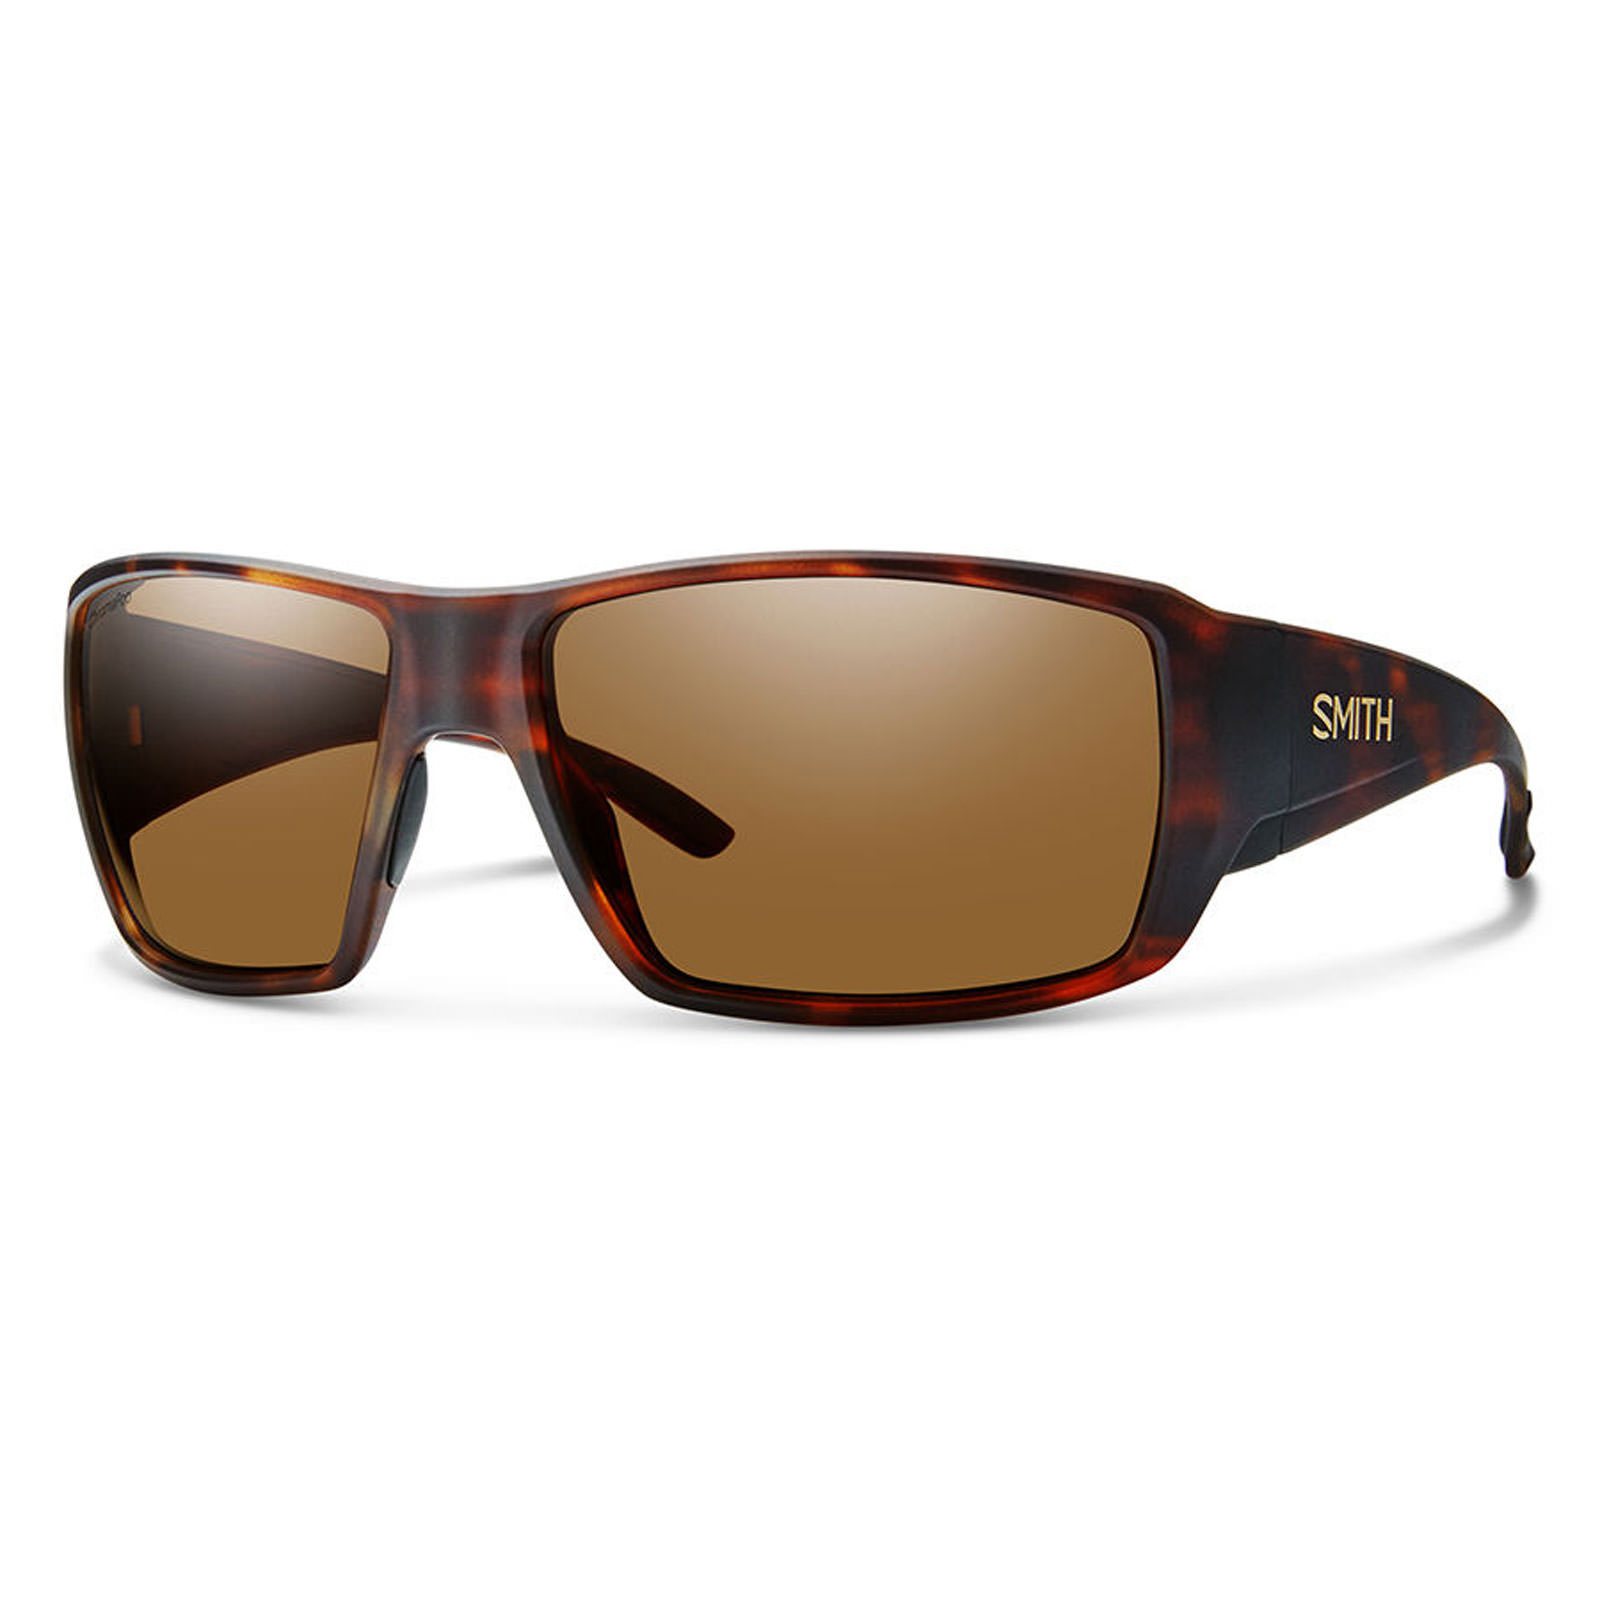 Sunglasses Smith Optics Guides Choice Chromapop